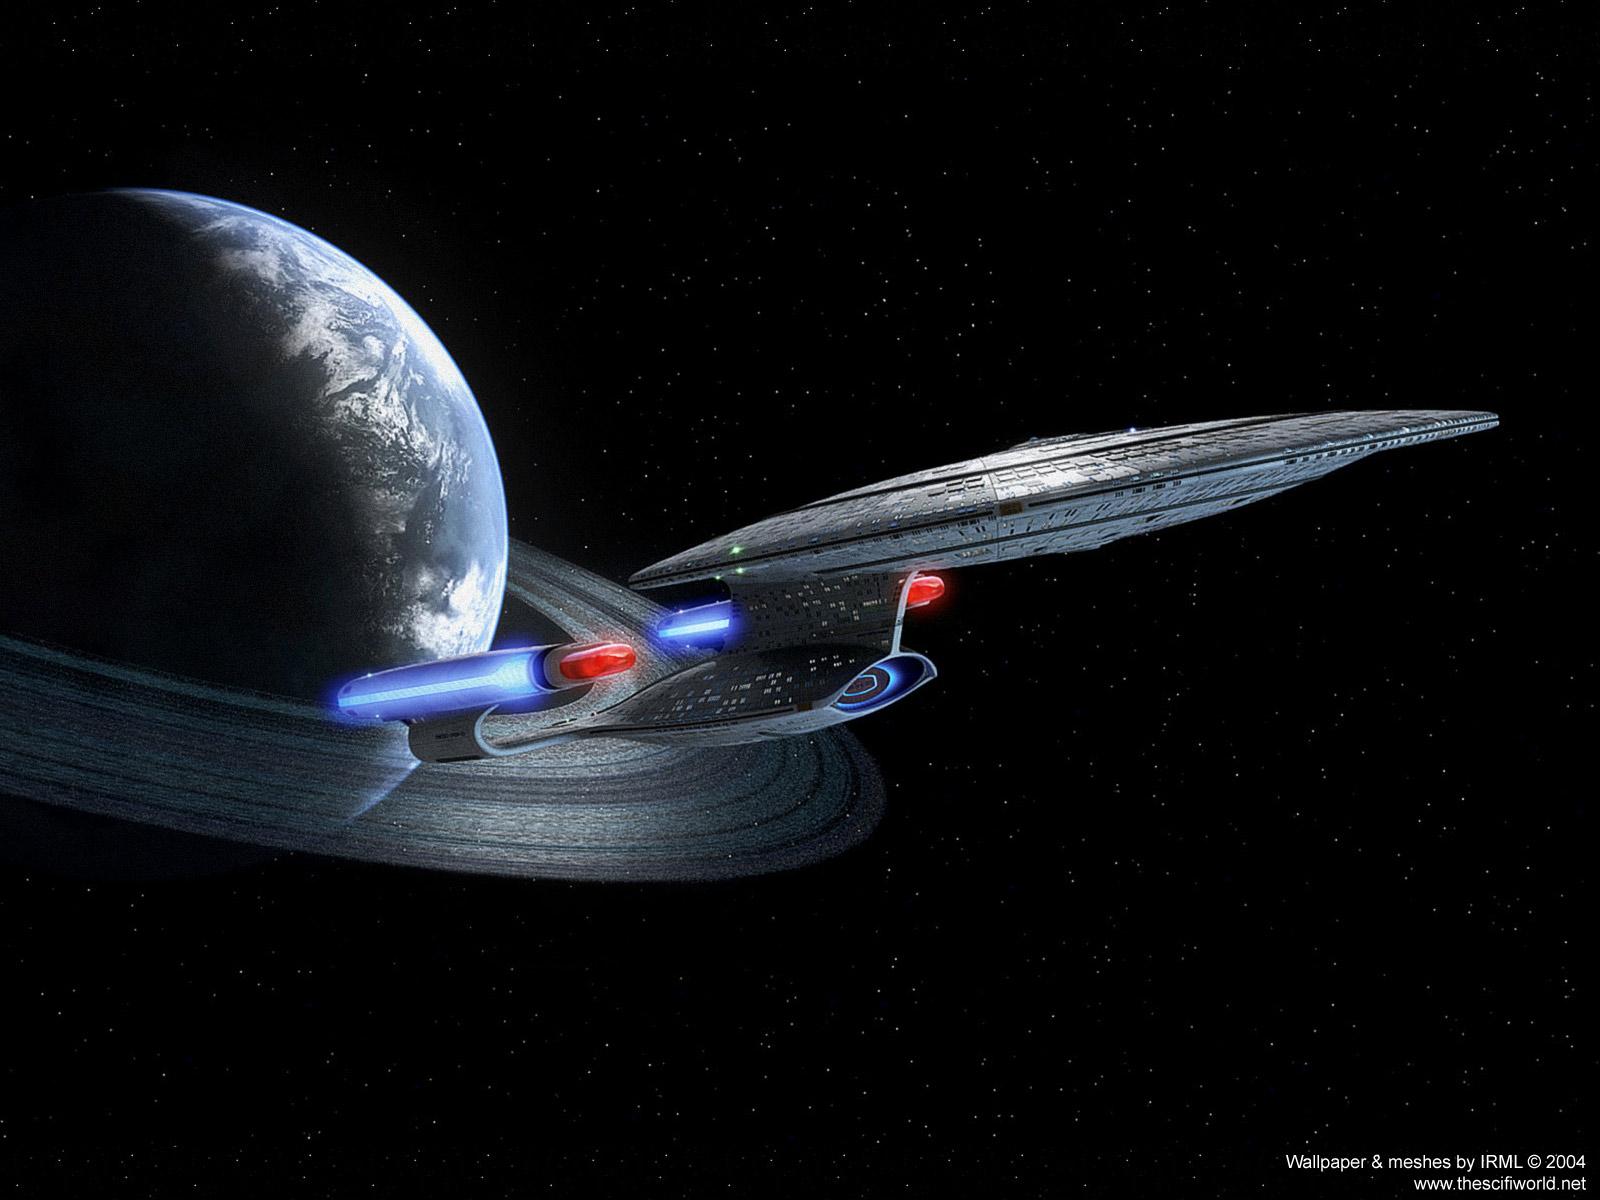 Enterprise leaving orbit   Star Trek computer desktop wallpaper 1600x1200